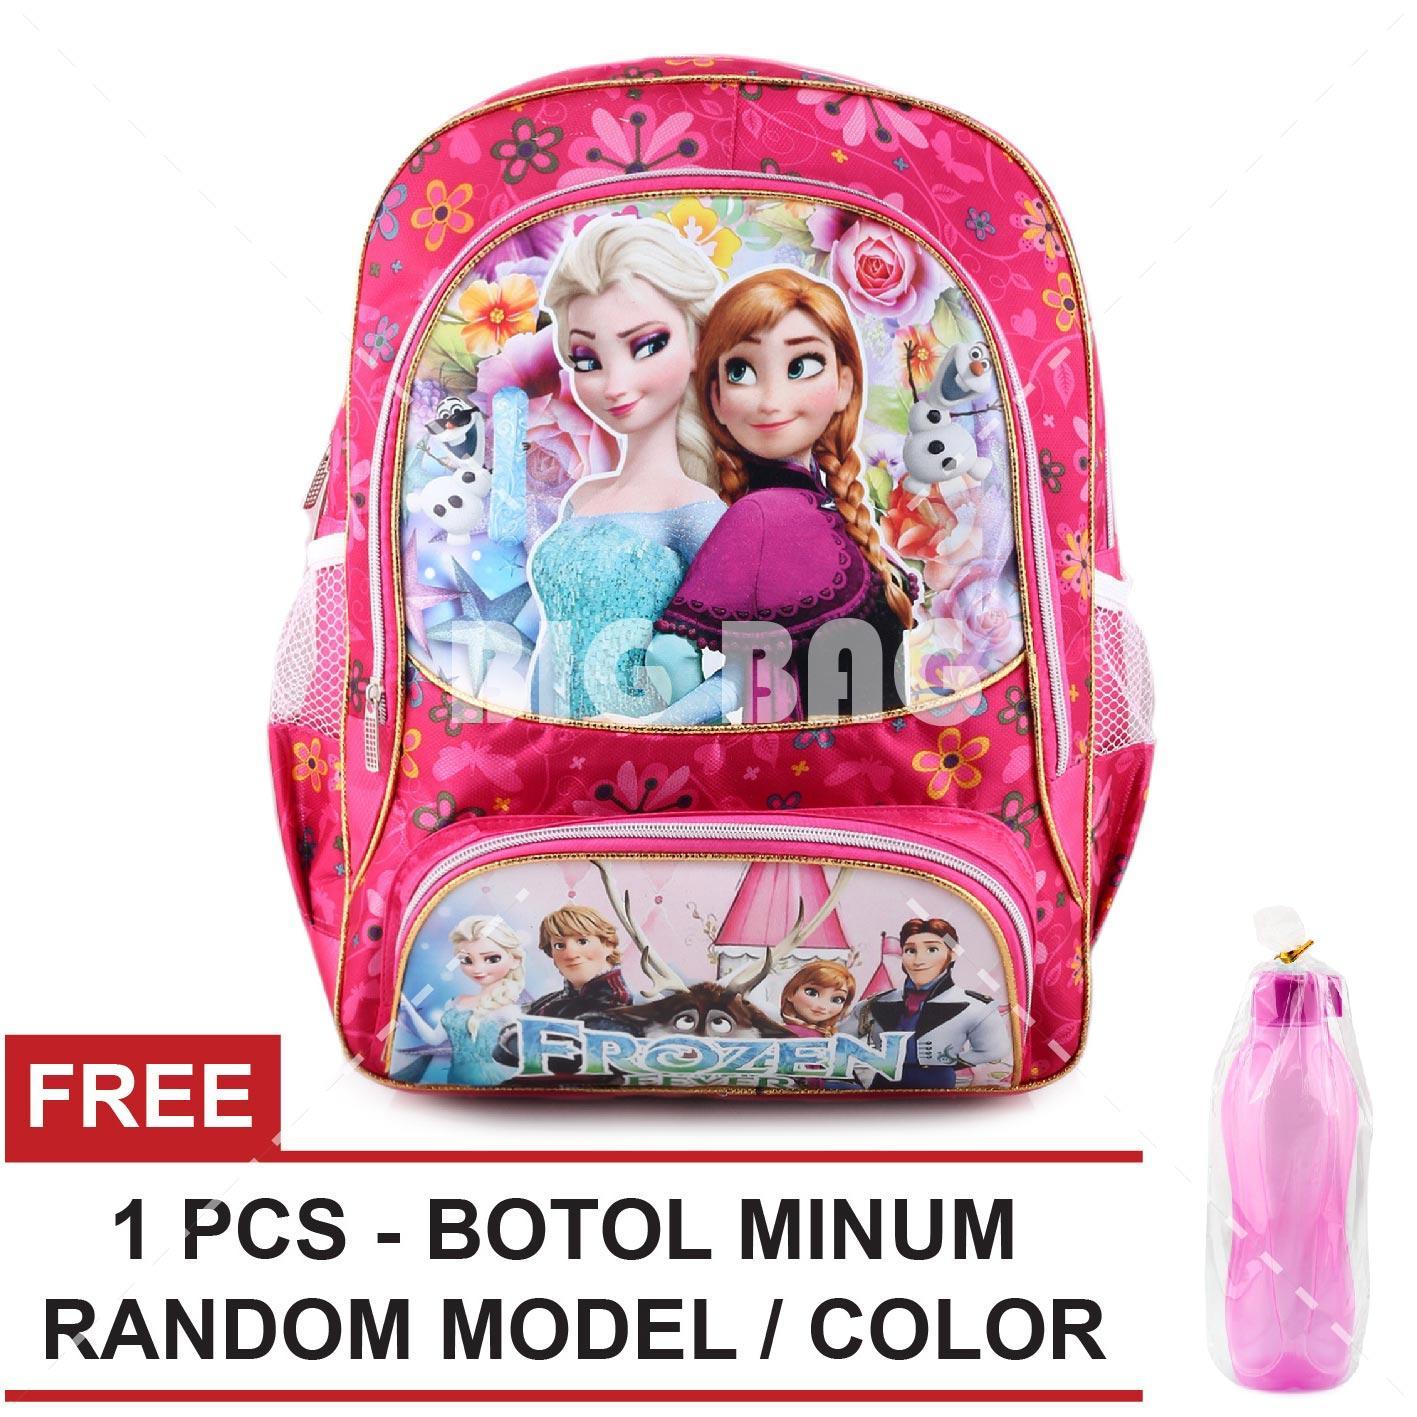 Tas Ransel Anak - Frozen Anna Elsa - True Love SW - School Bag Tas Sekolah Anak - PINK + FREE Botol Minum  Random Color / Model Tas Anak Tas Sekolah Tas Anak Karakter